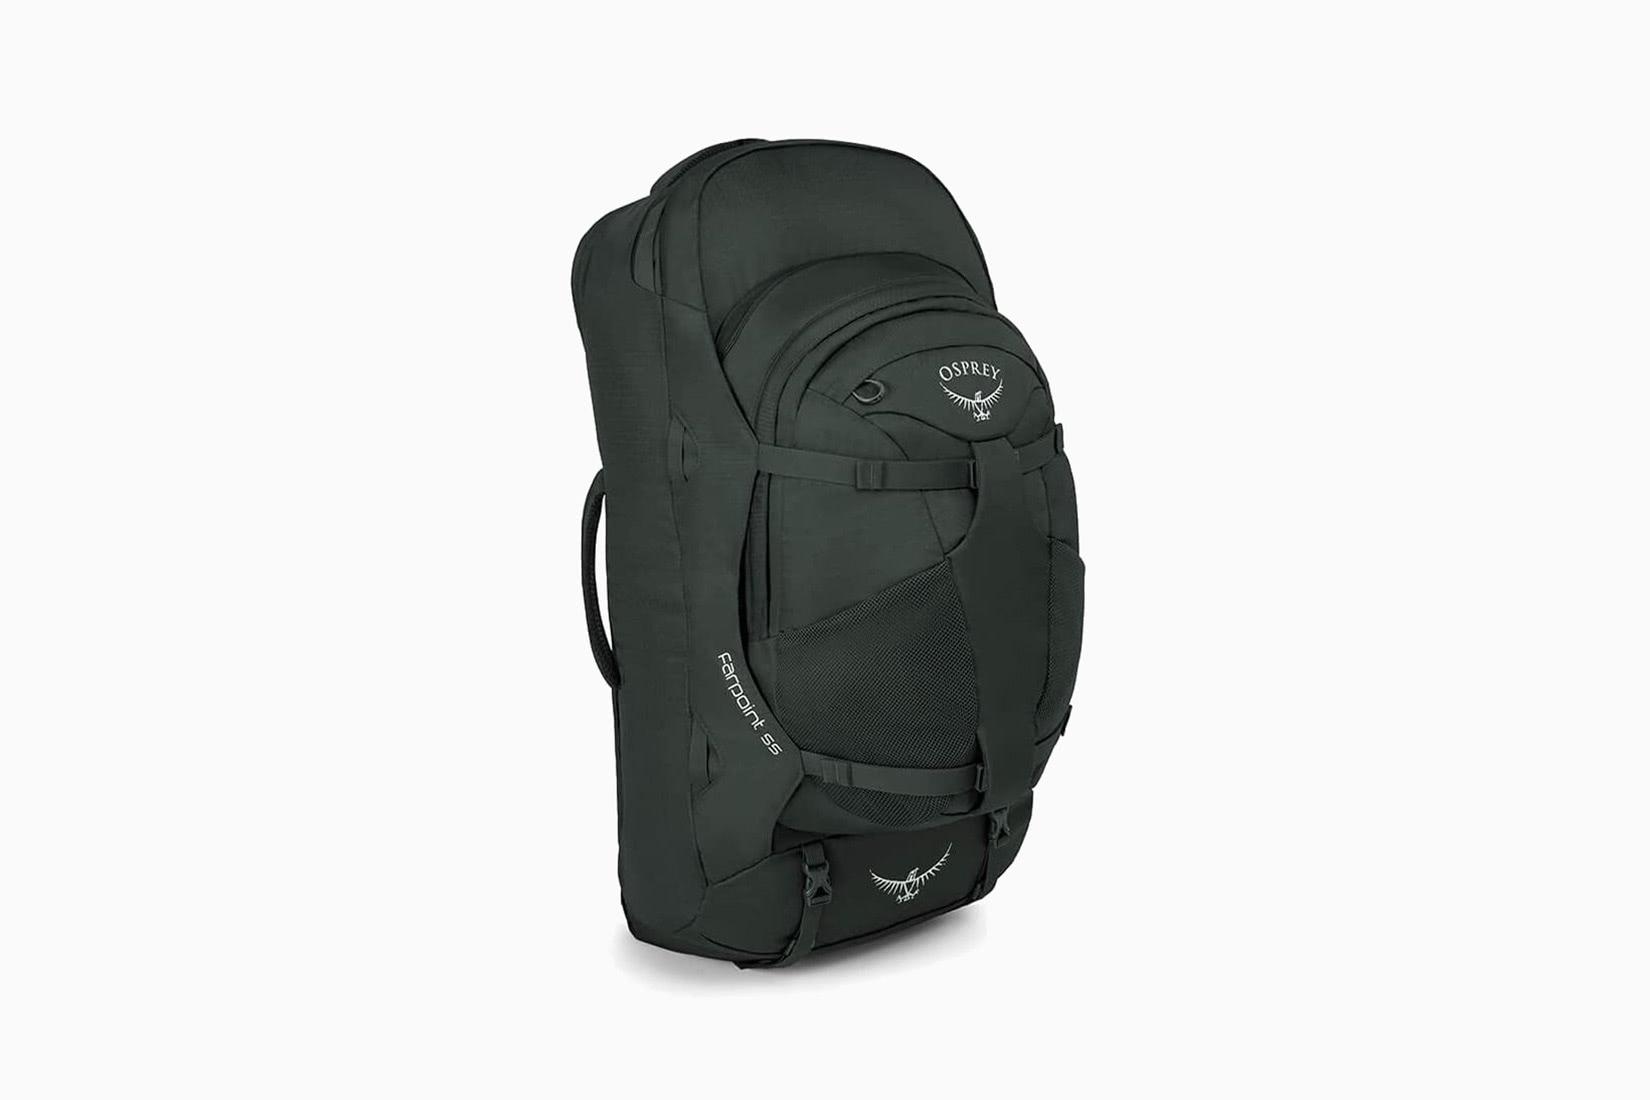 best travel backpack osprey farpoint 55 - Luxe Digital